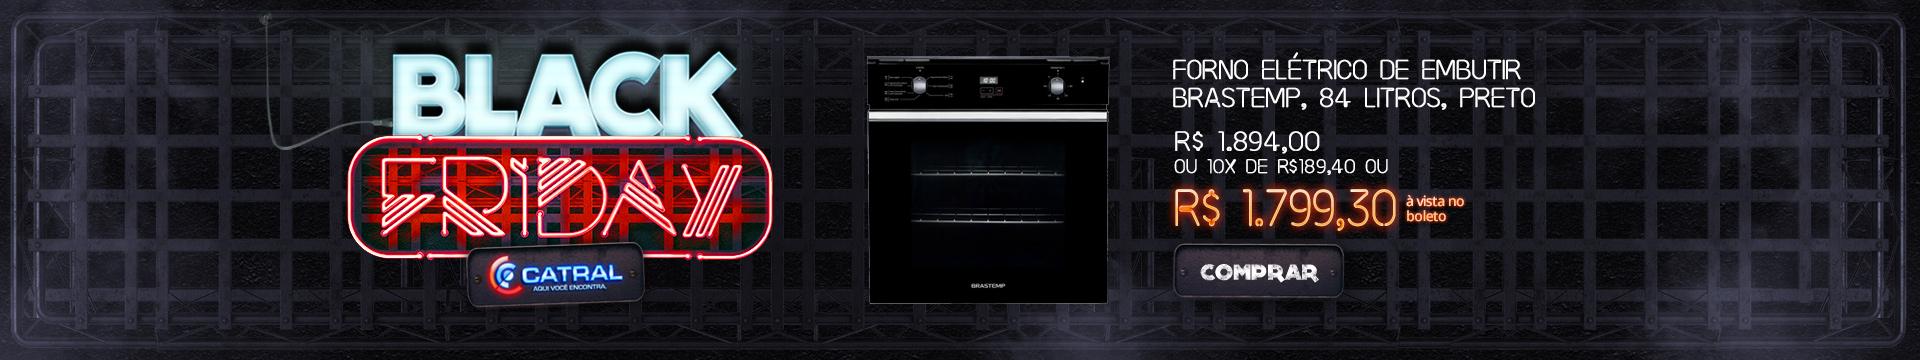 Black friday - produto 6